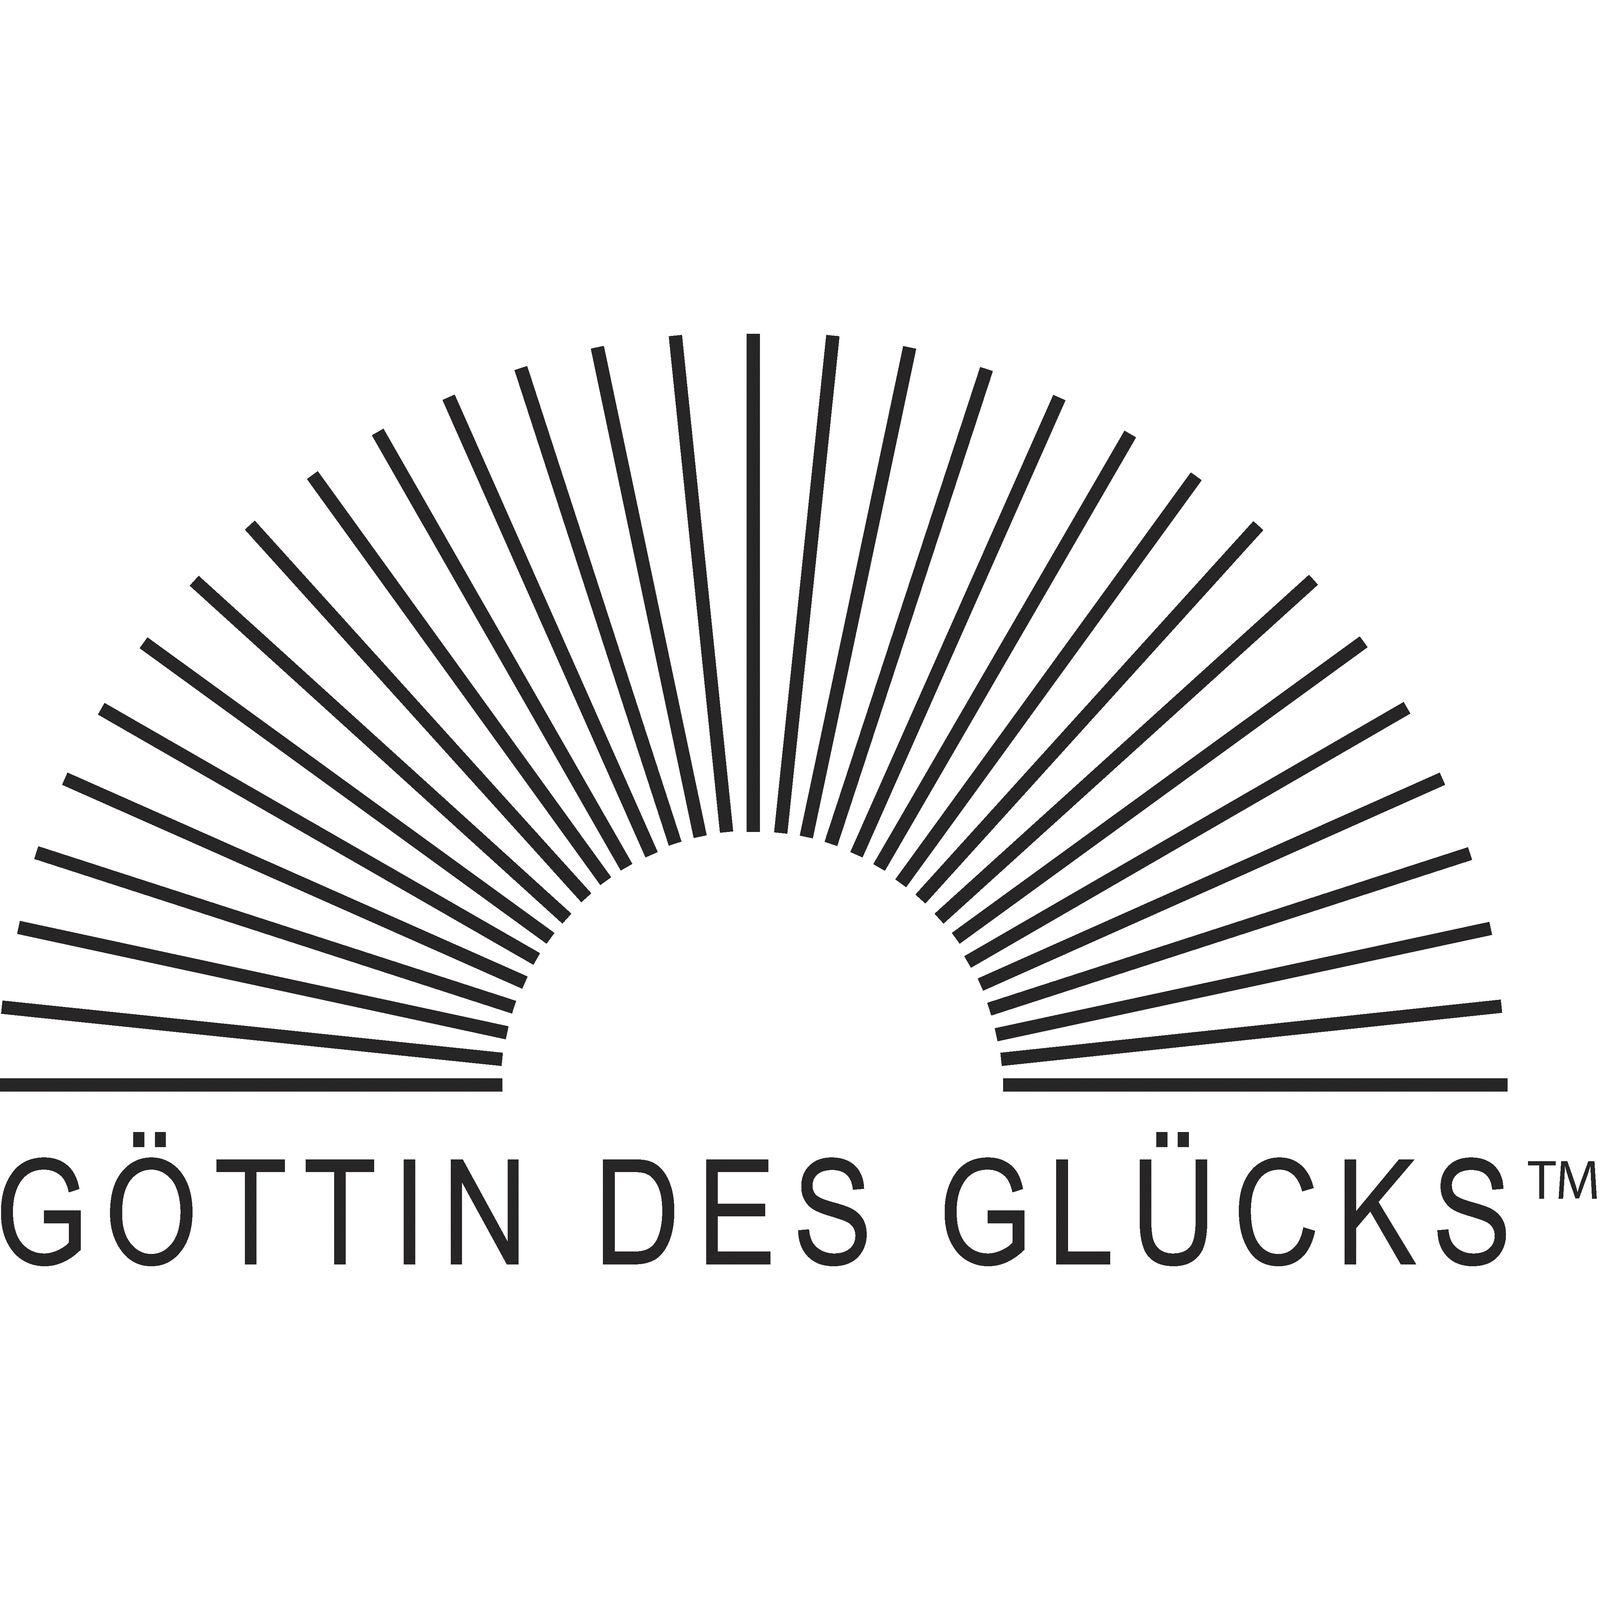 GÖTTIN DES GLÜCKS™